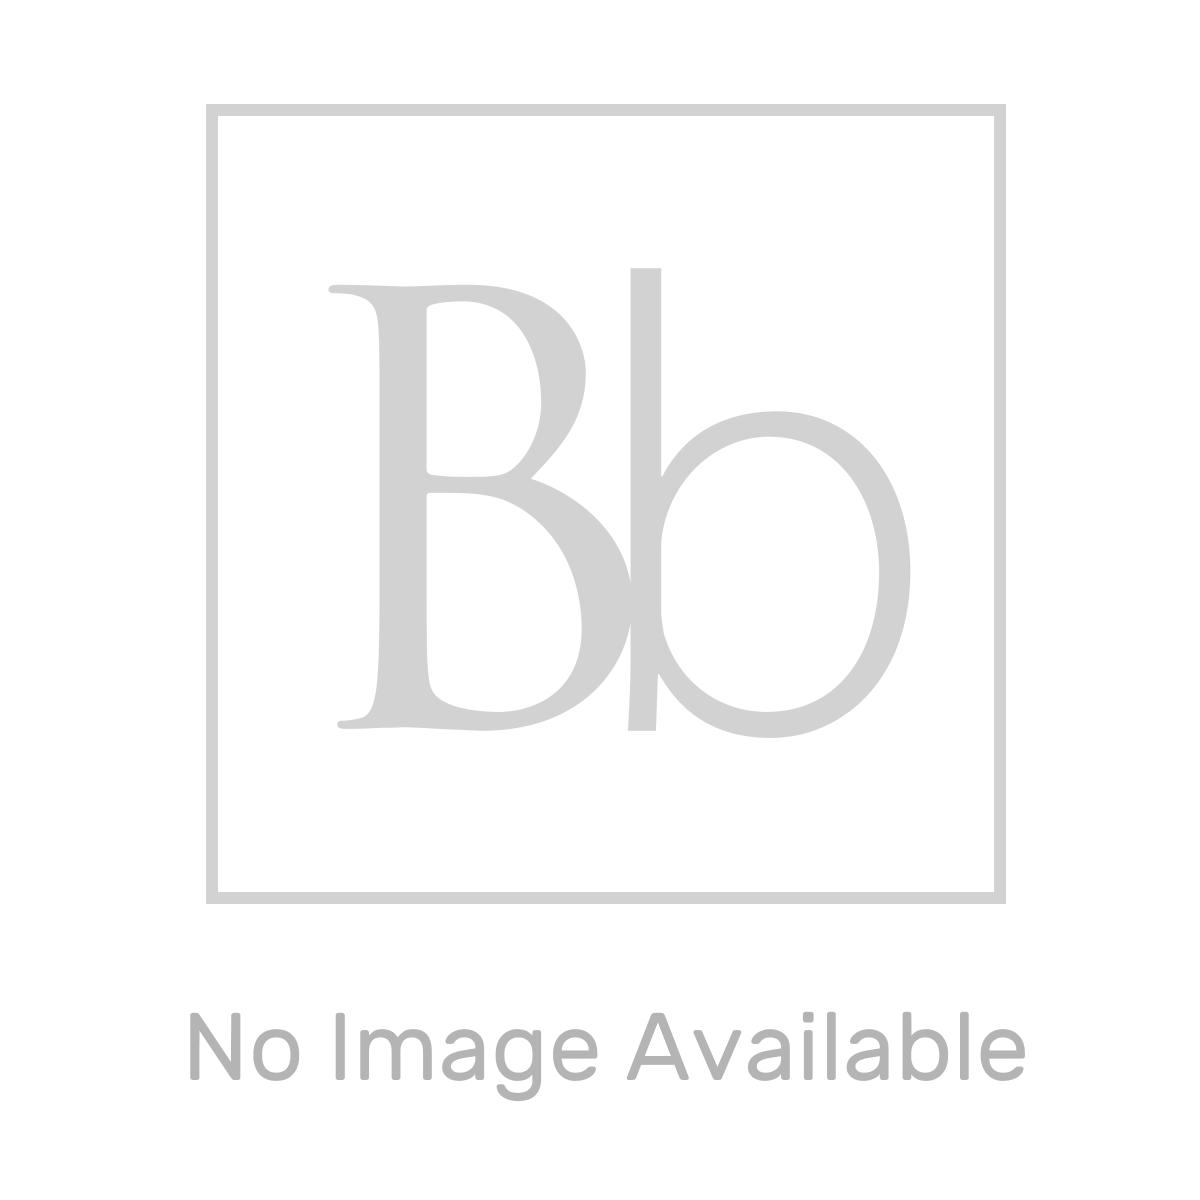 Merlyn Truestone Slate Black Rectangular Shower Tray 1600 x 800mm